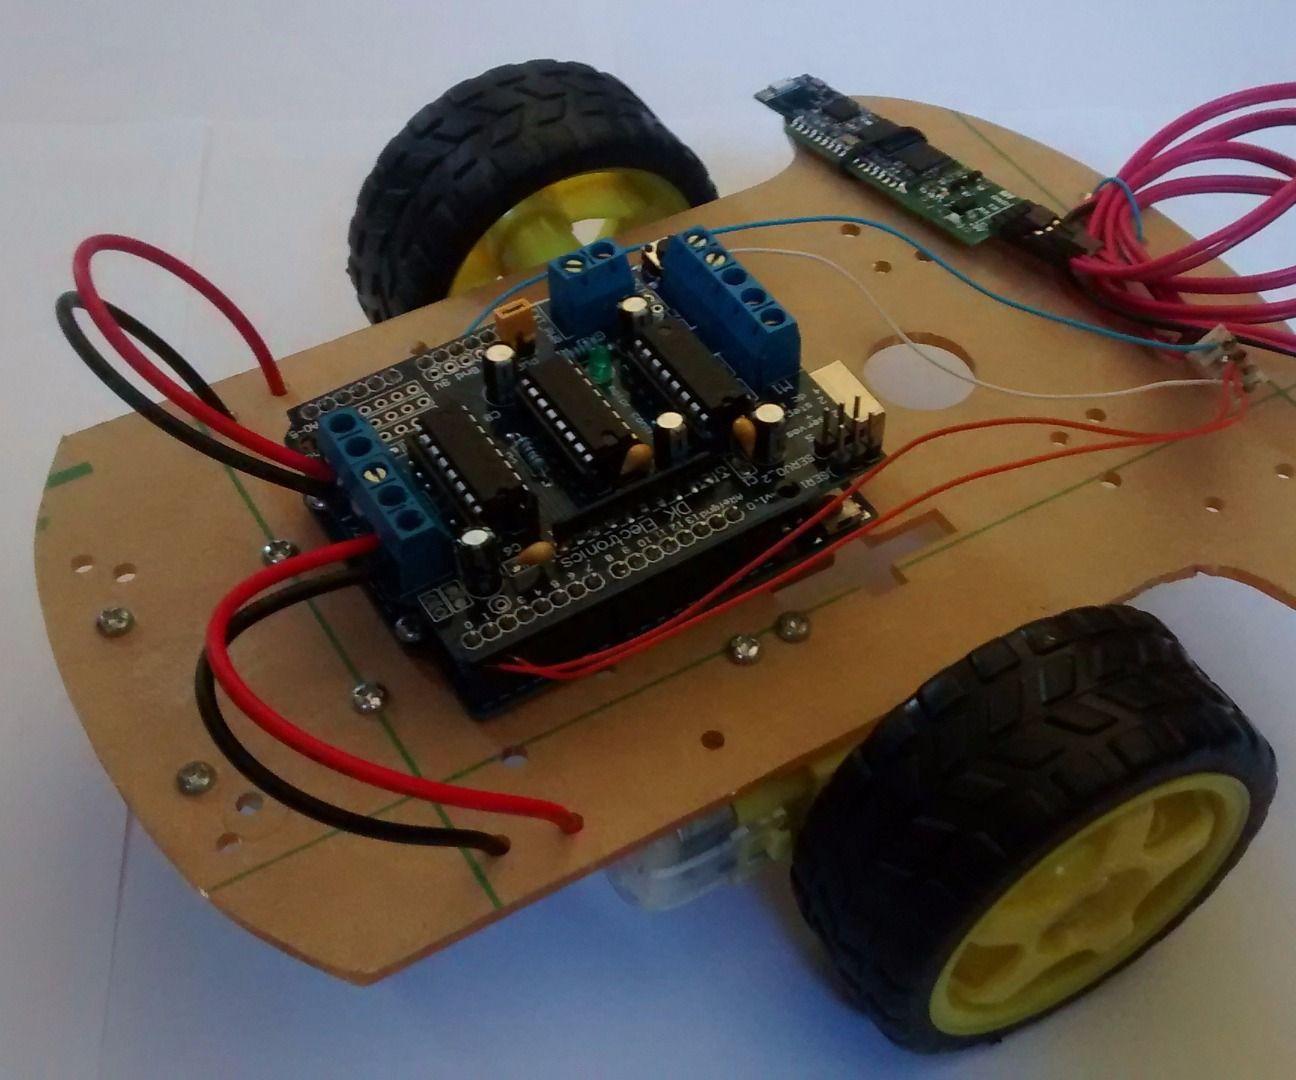 How to Control an Arduino Car Via Bluetooth (for Beginners